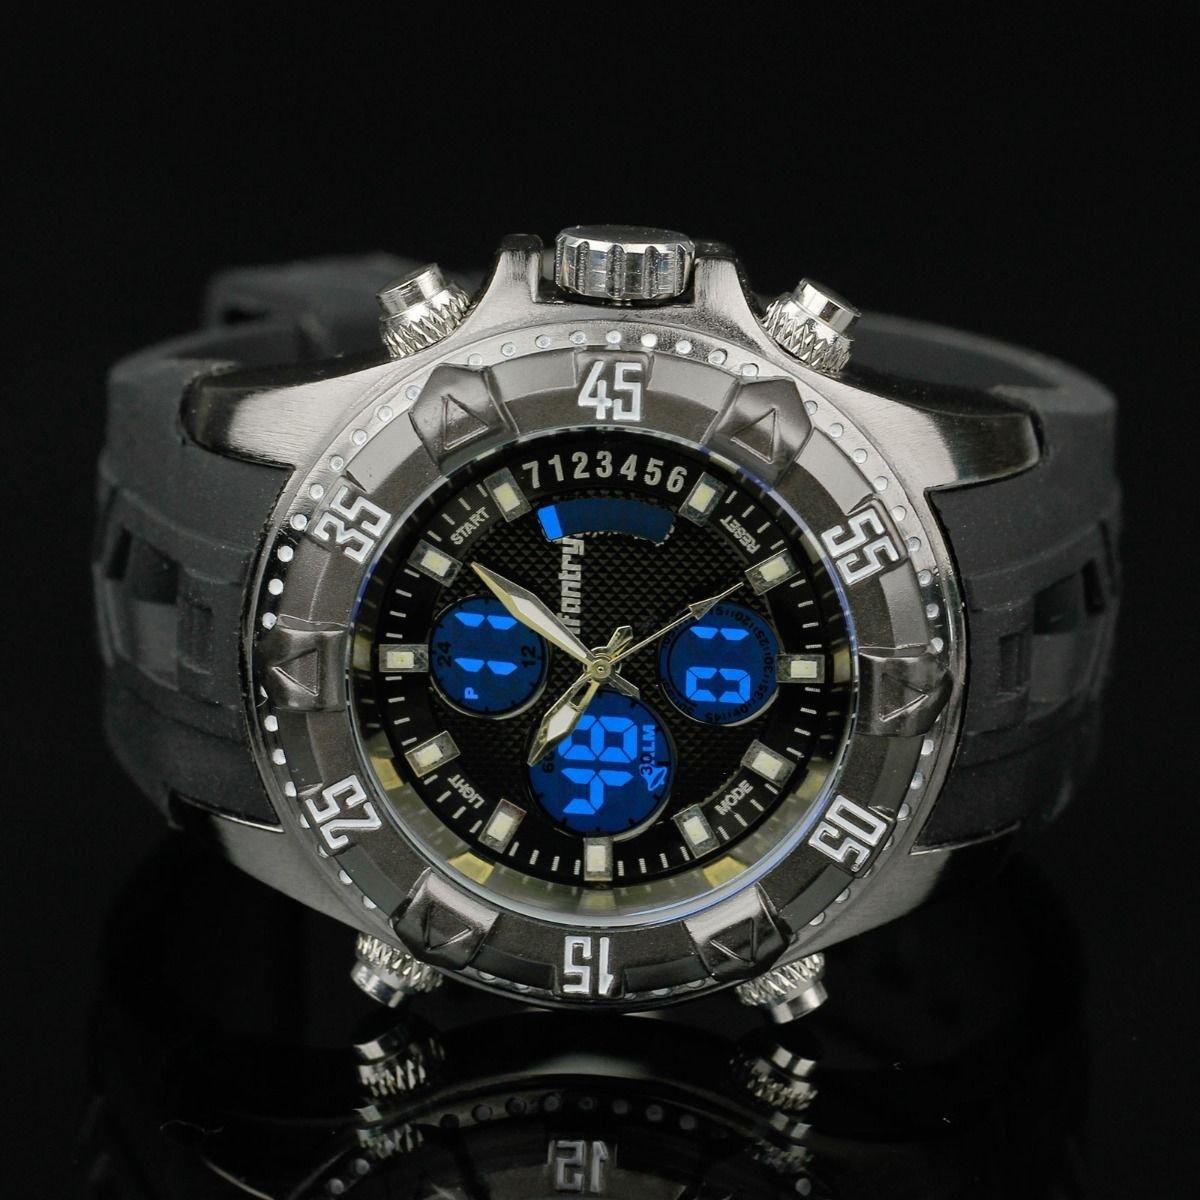 Infantry Aviator Lume Chronograph Dual Quartz Digital Wrist Watch Day Date Alarm